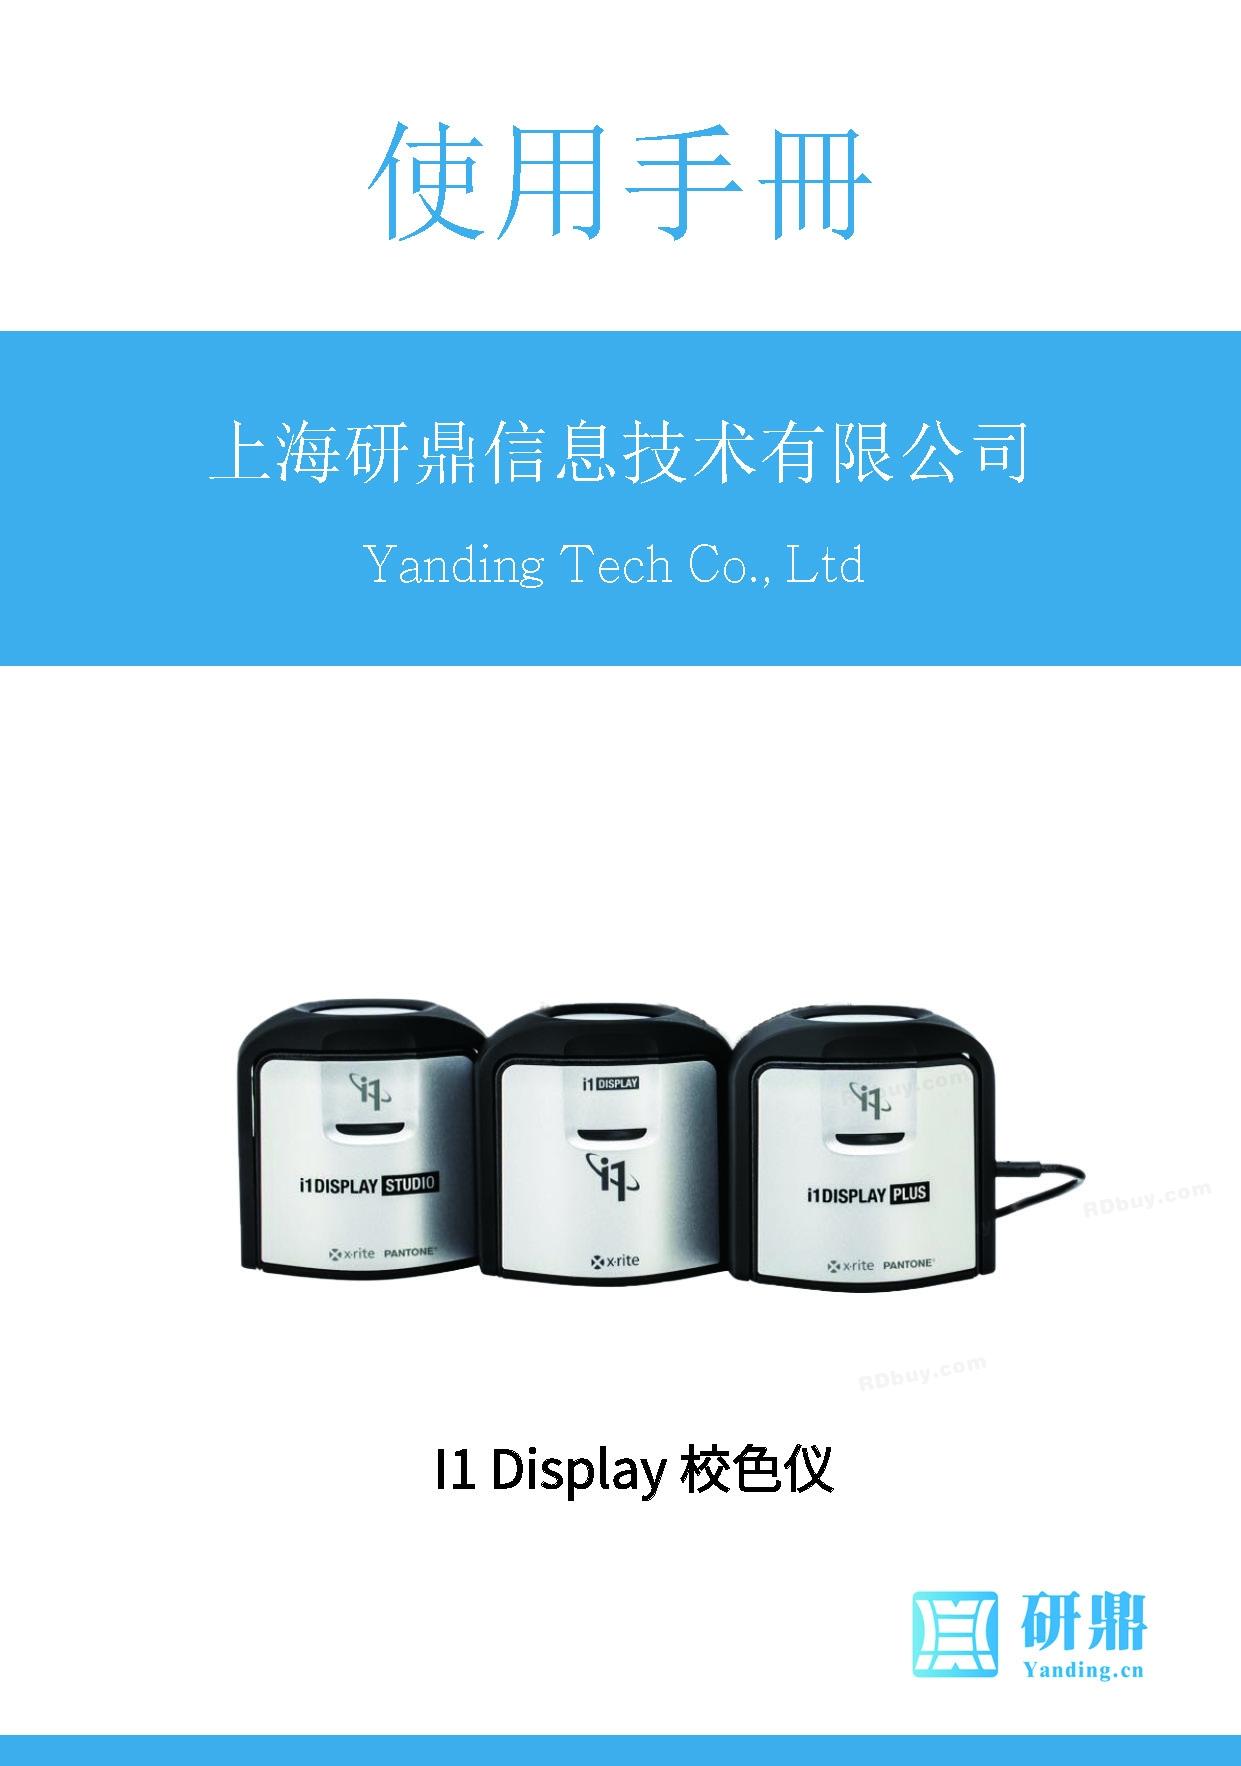 i1 display pro_页面_01.jpg